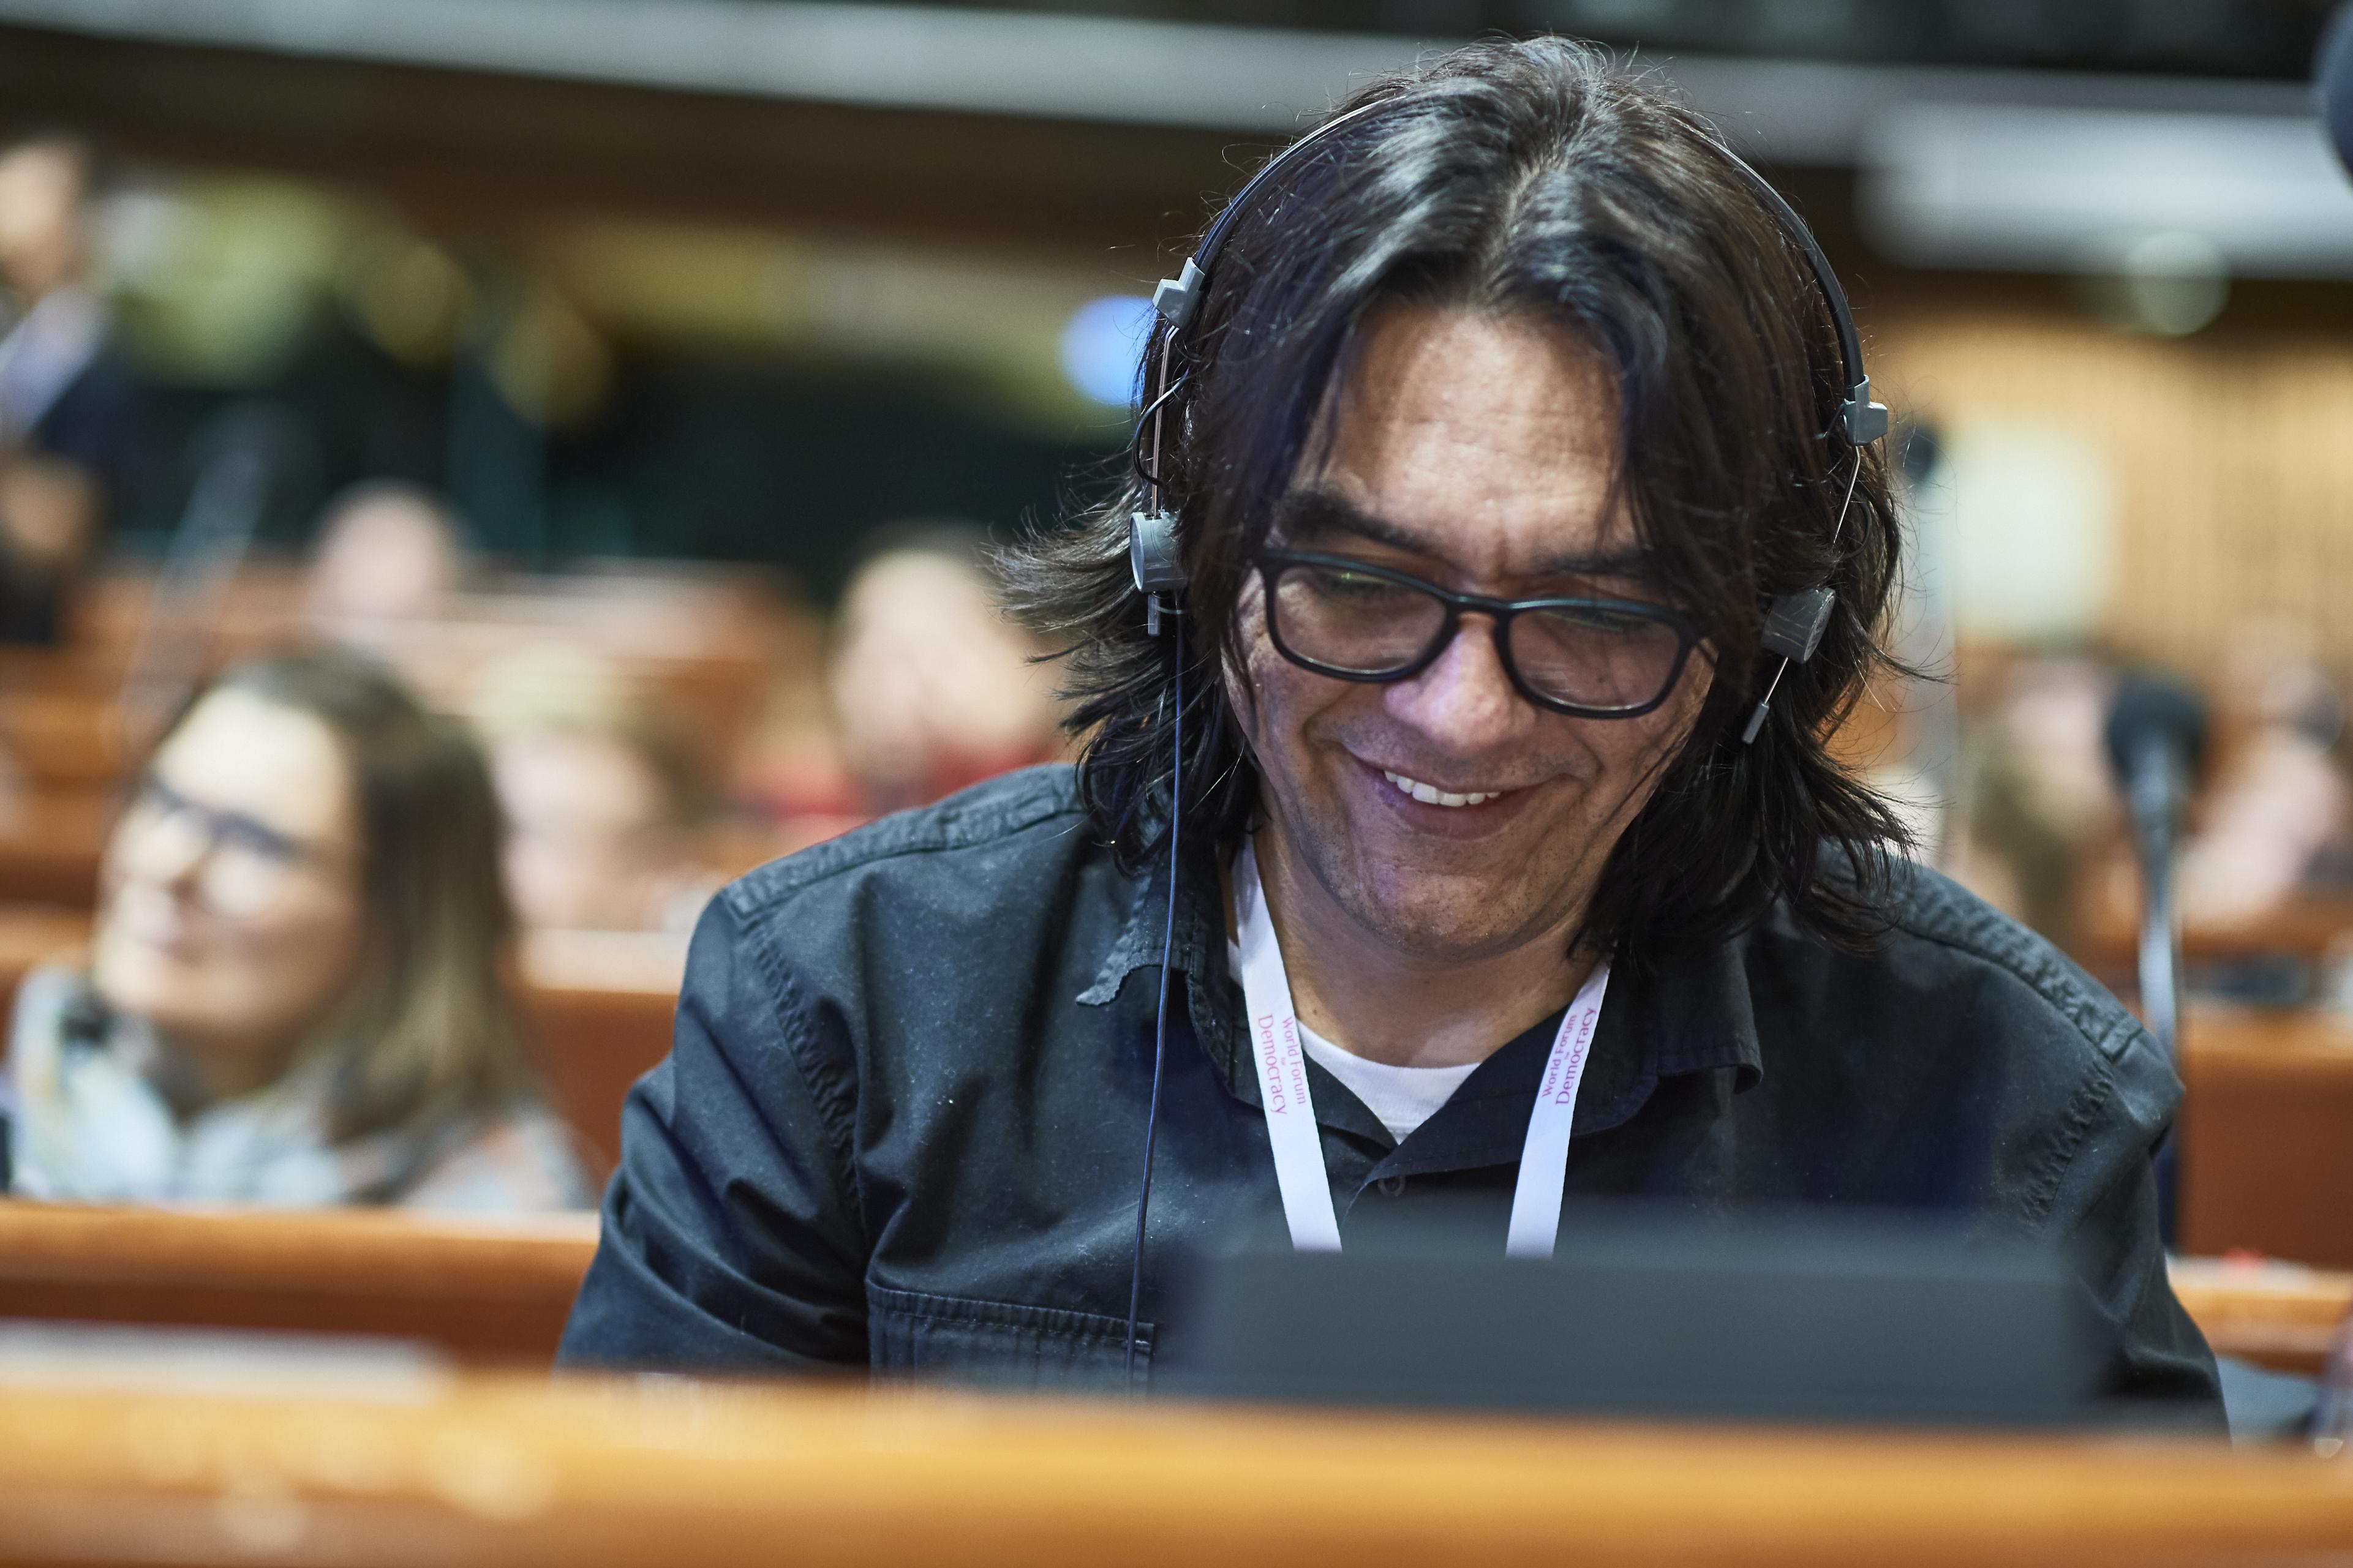 24 Pedro x. Molina (Nicaragua) – Sandro Weltin – Council of Europe